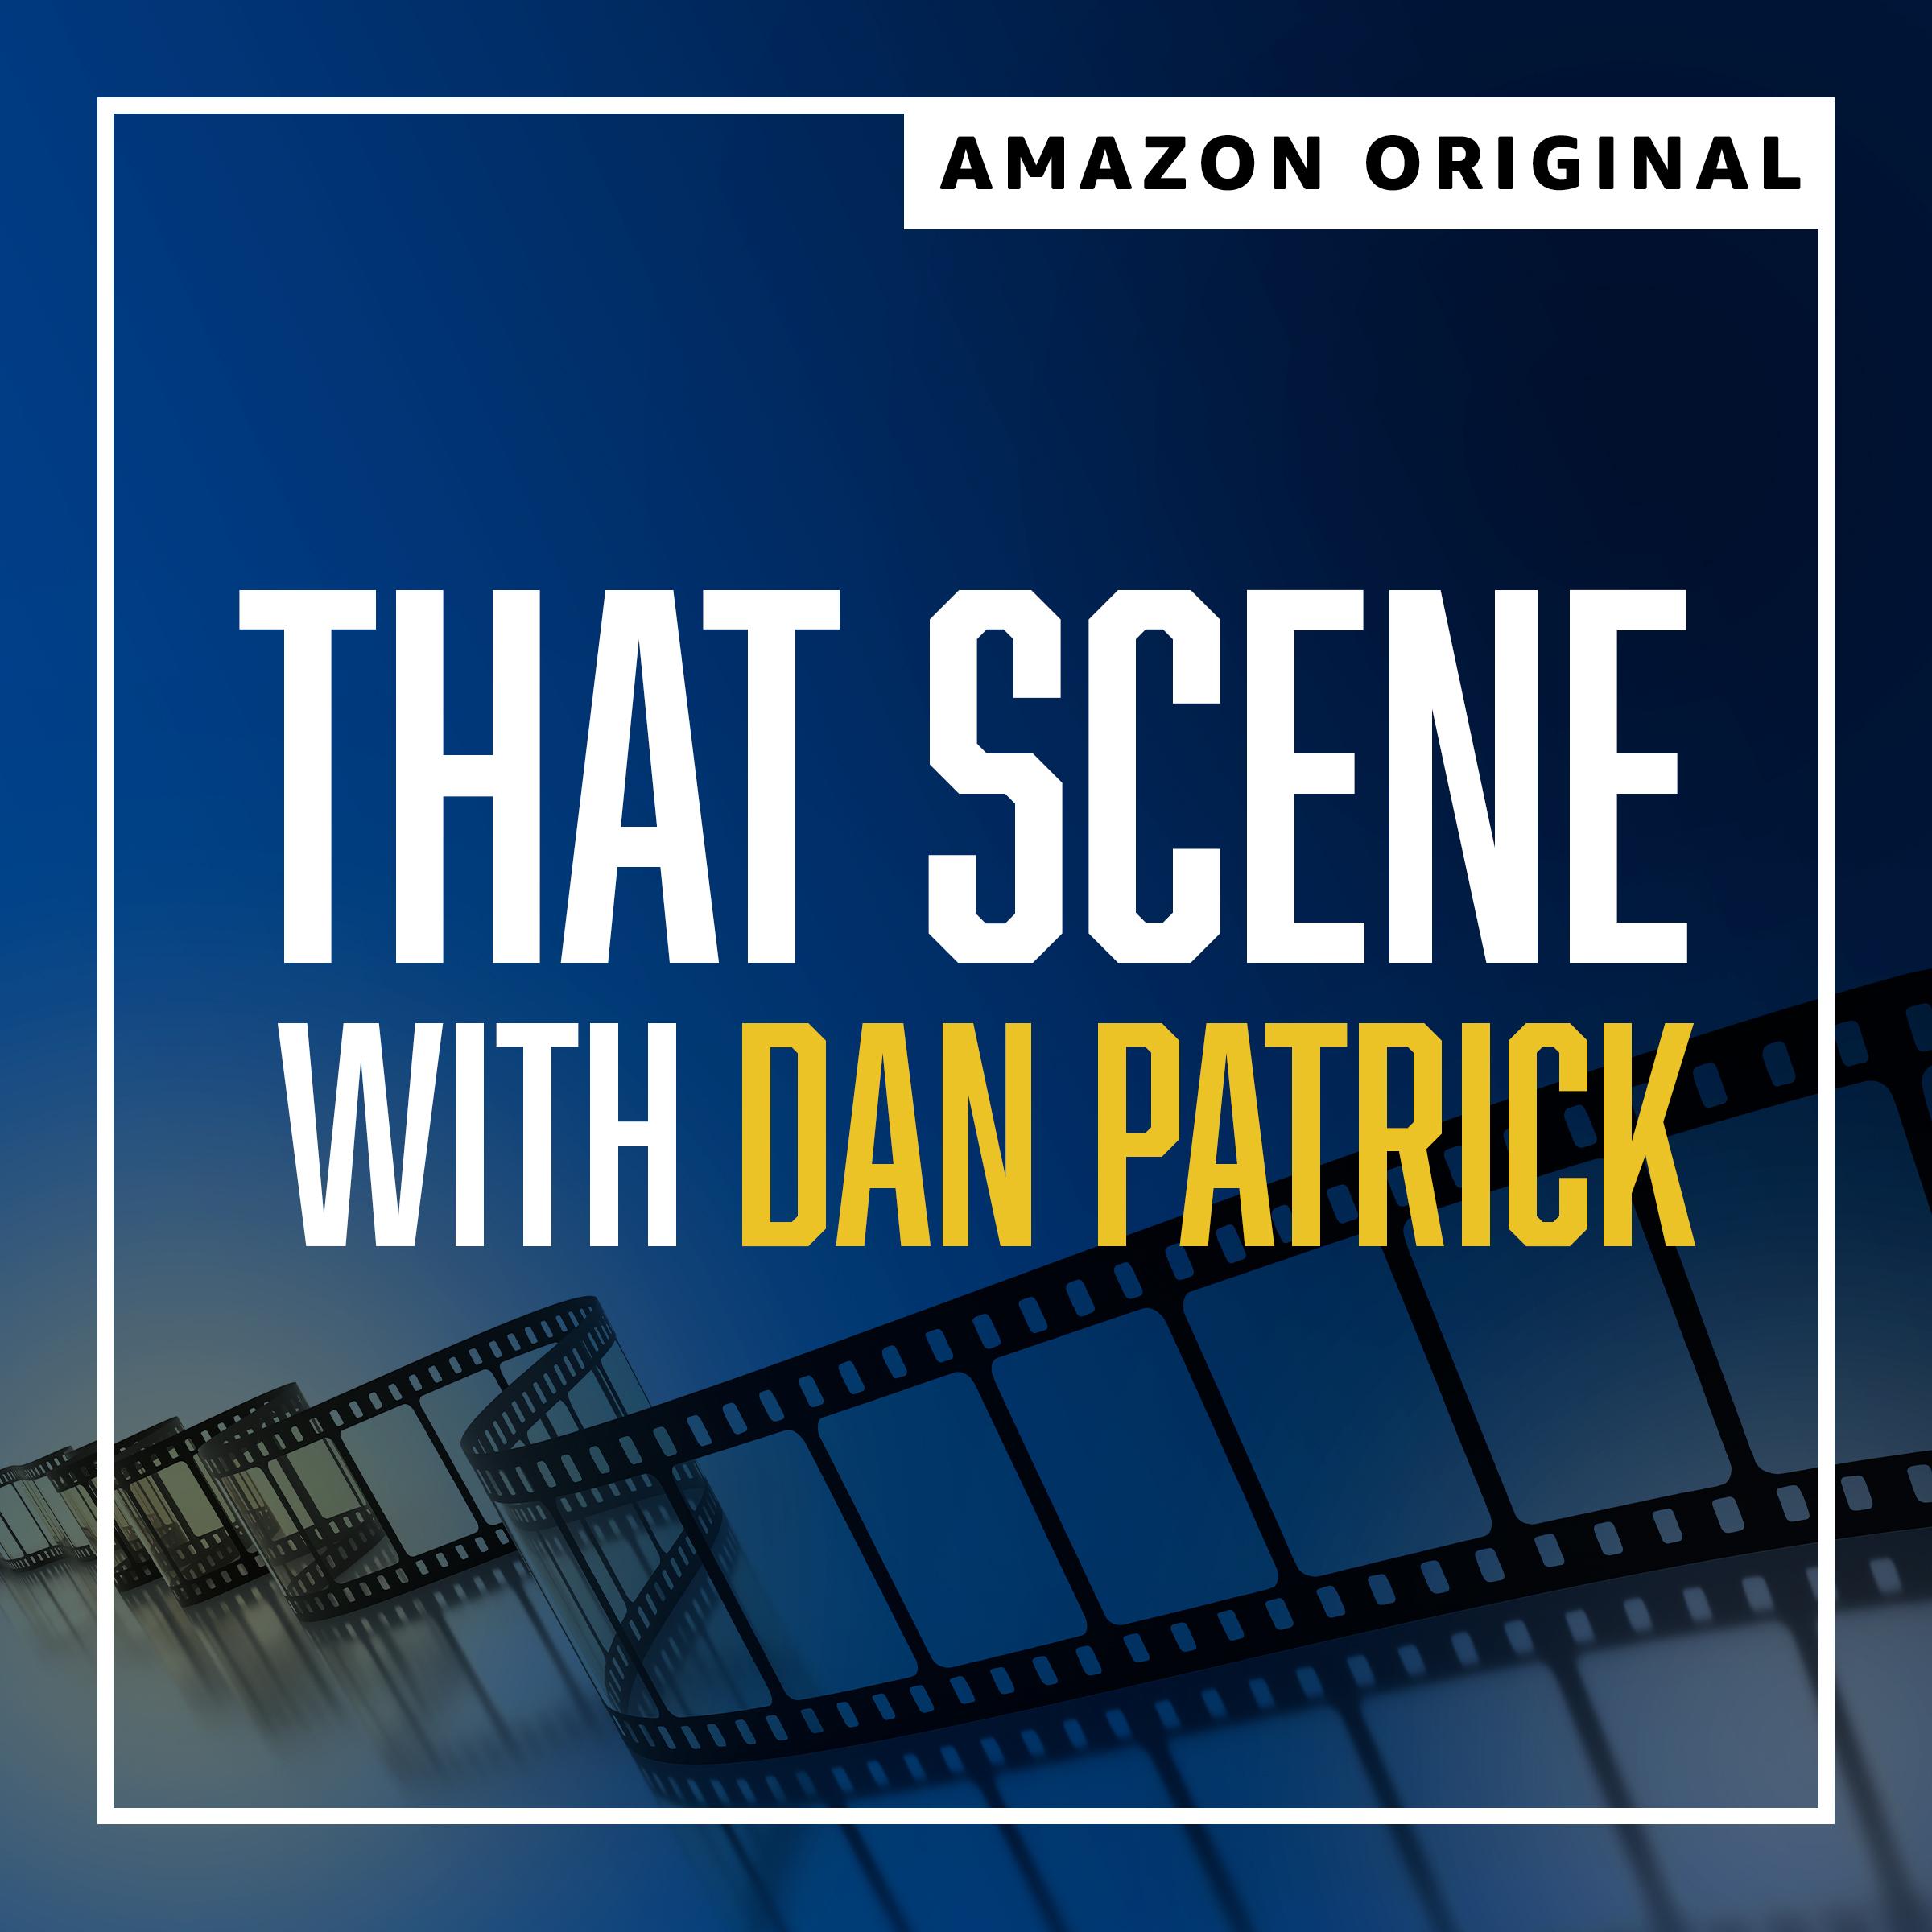 That_Scene_S2_Amazon_Original_2400x2400 (1)